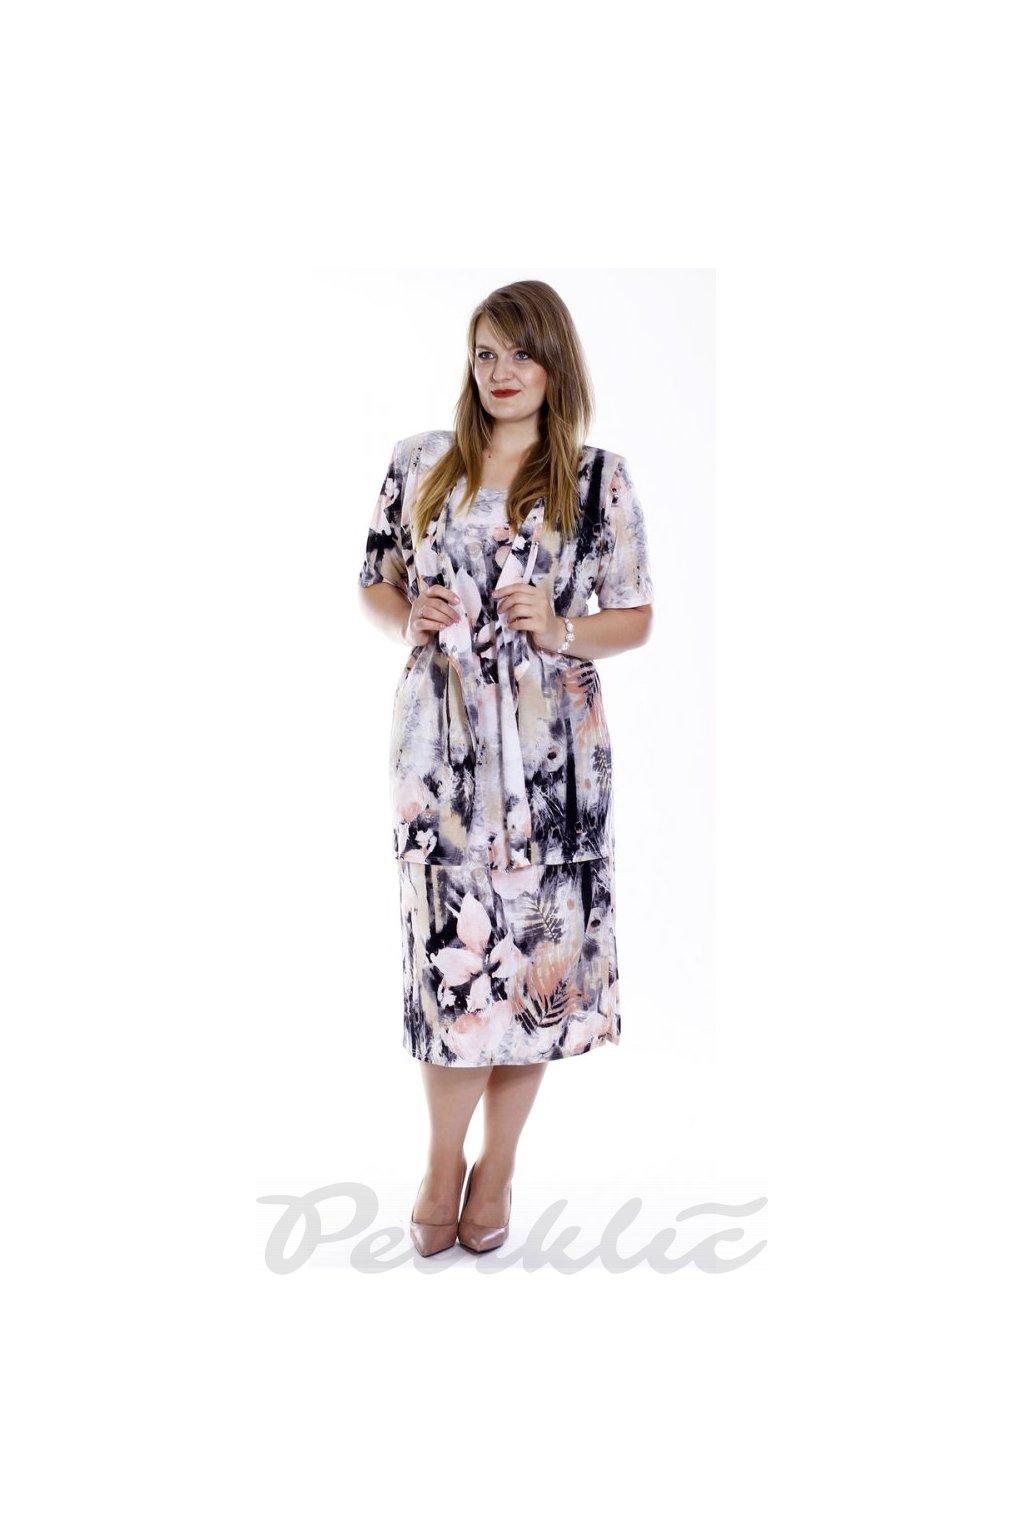 NORA - šaty s vestou 110 cm